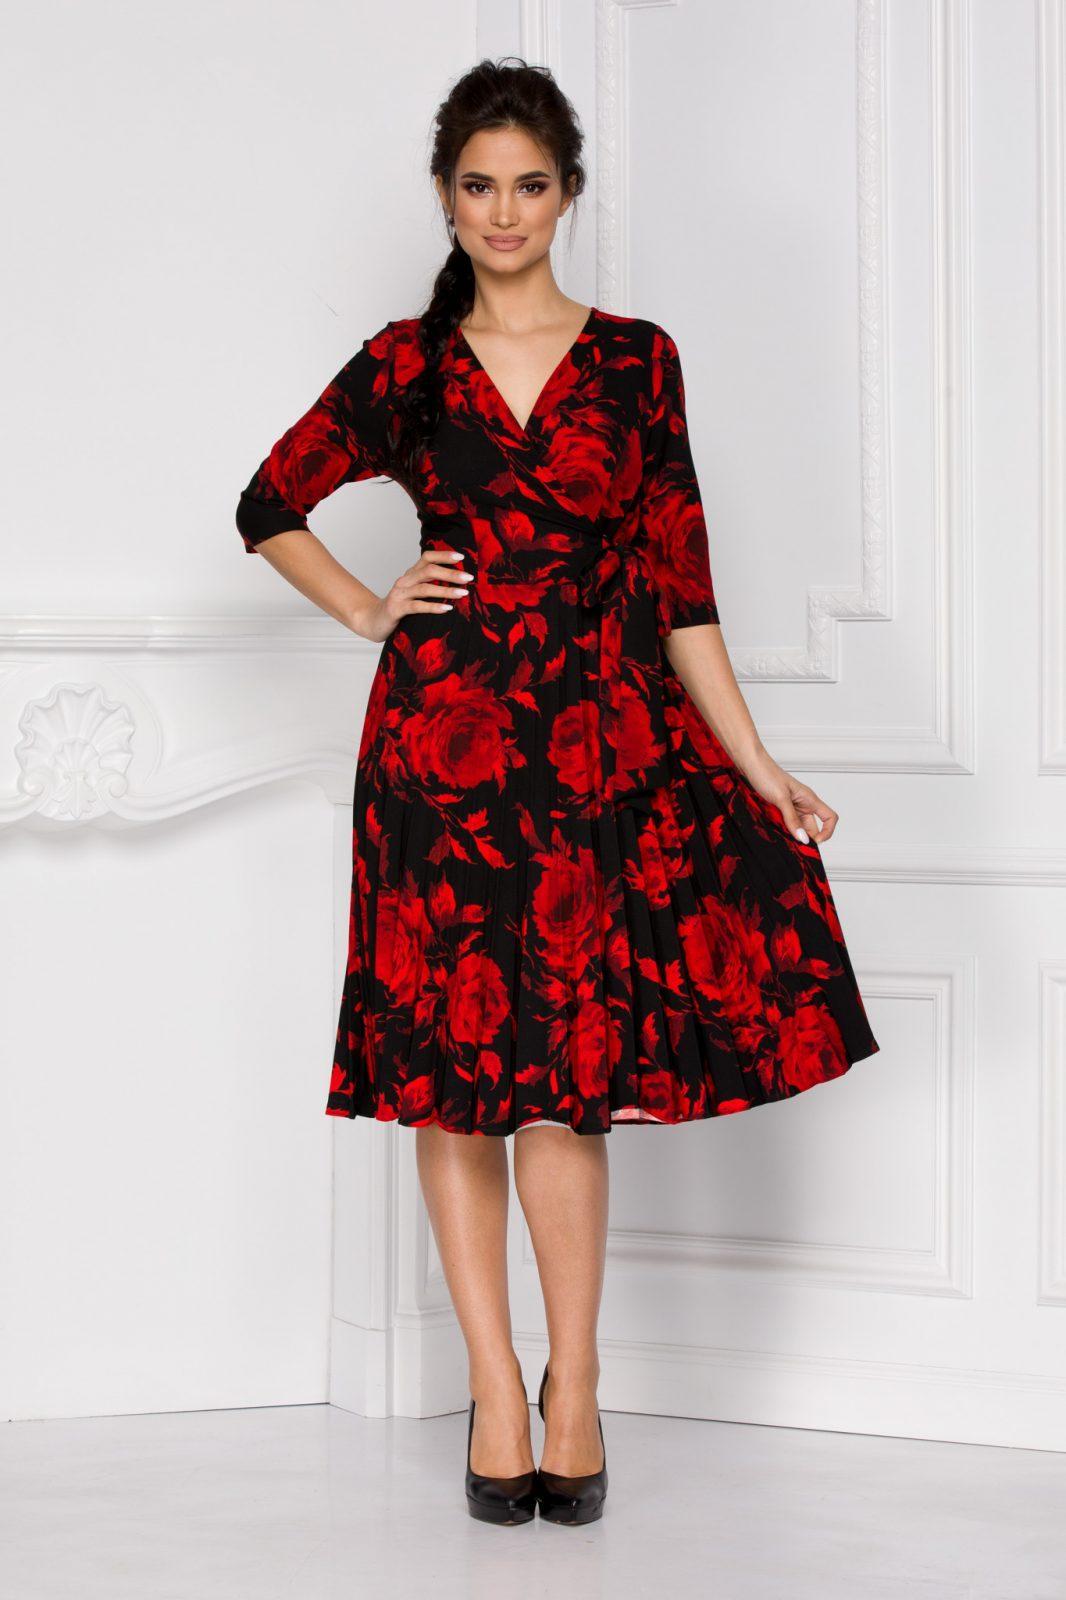 Floreal Κόκκινο Φόρεμα 5925